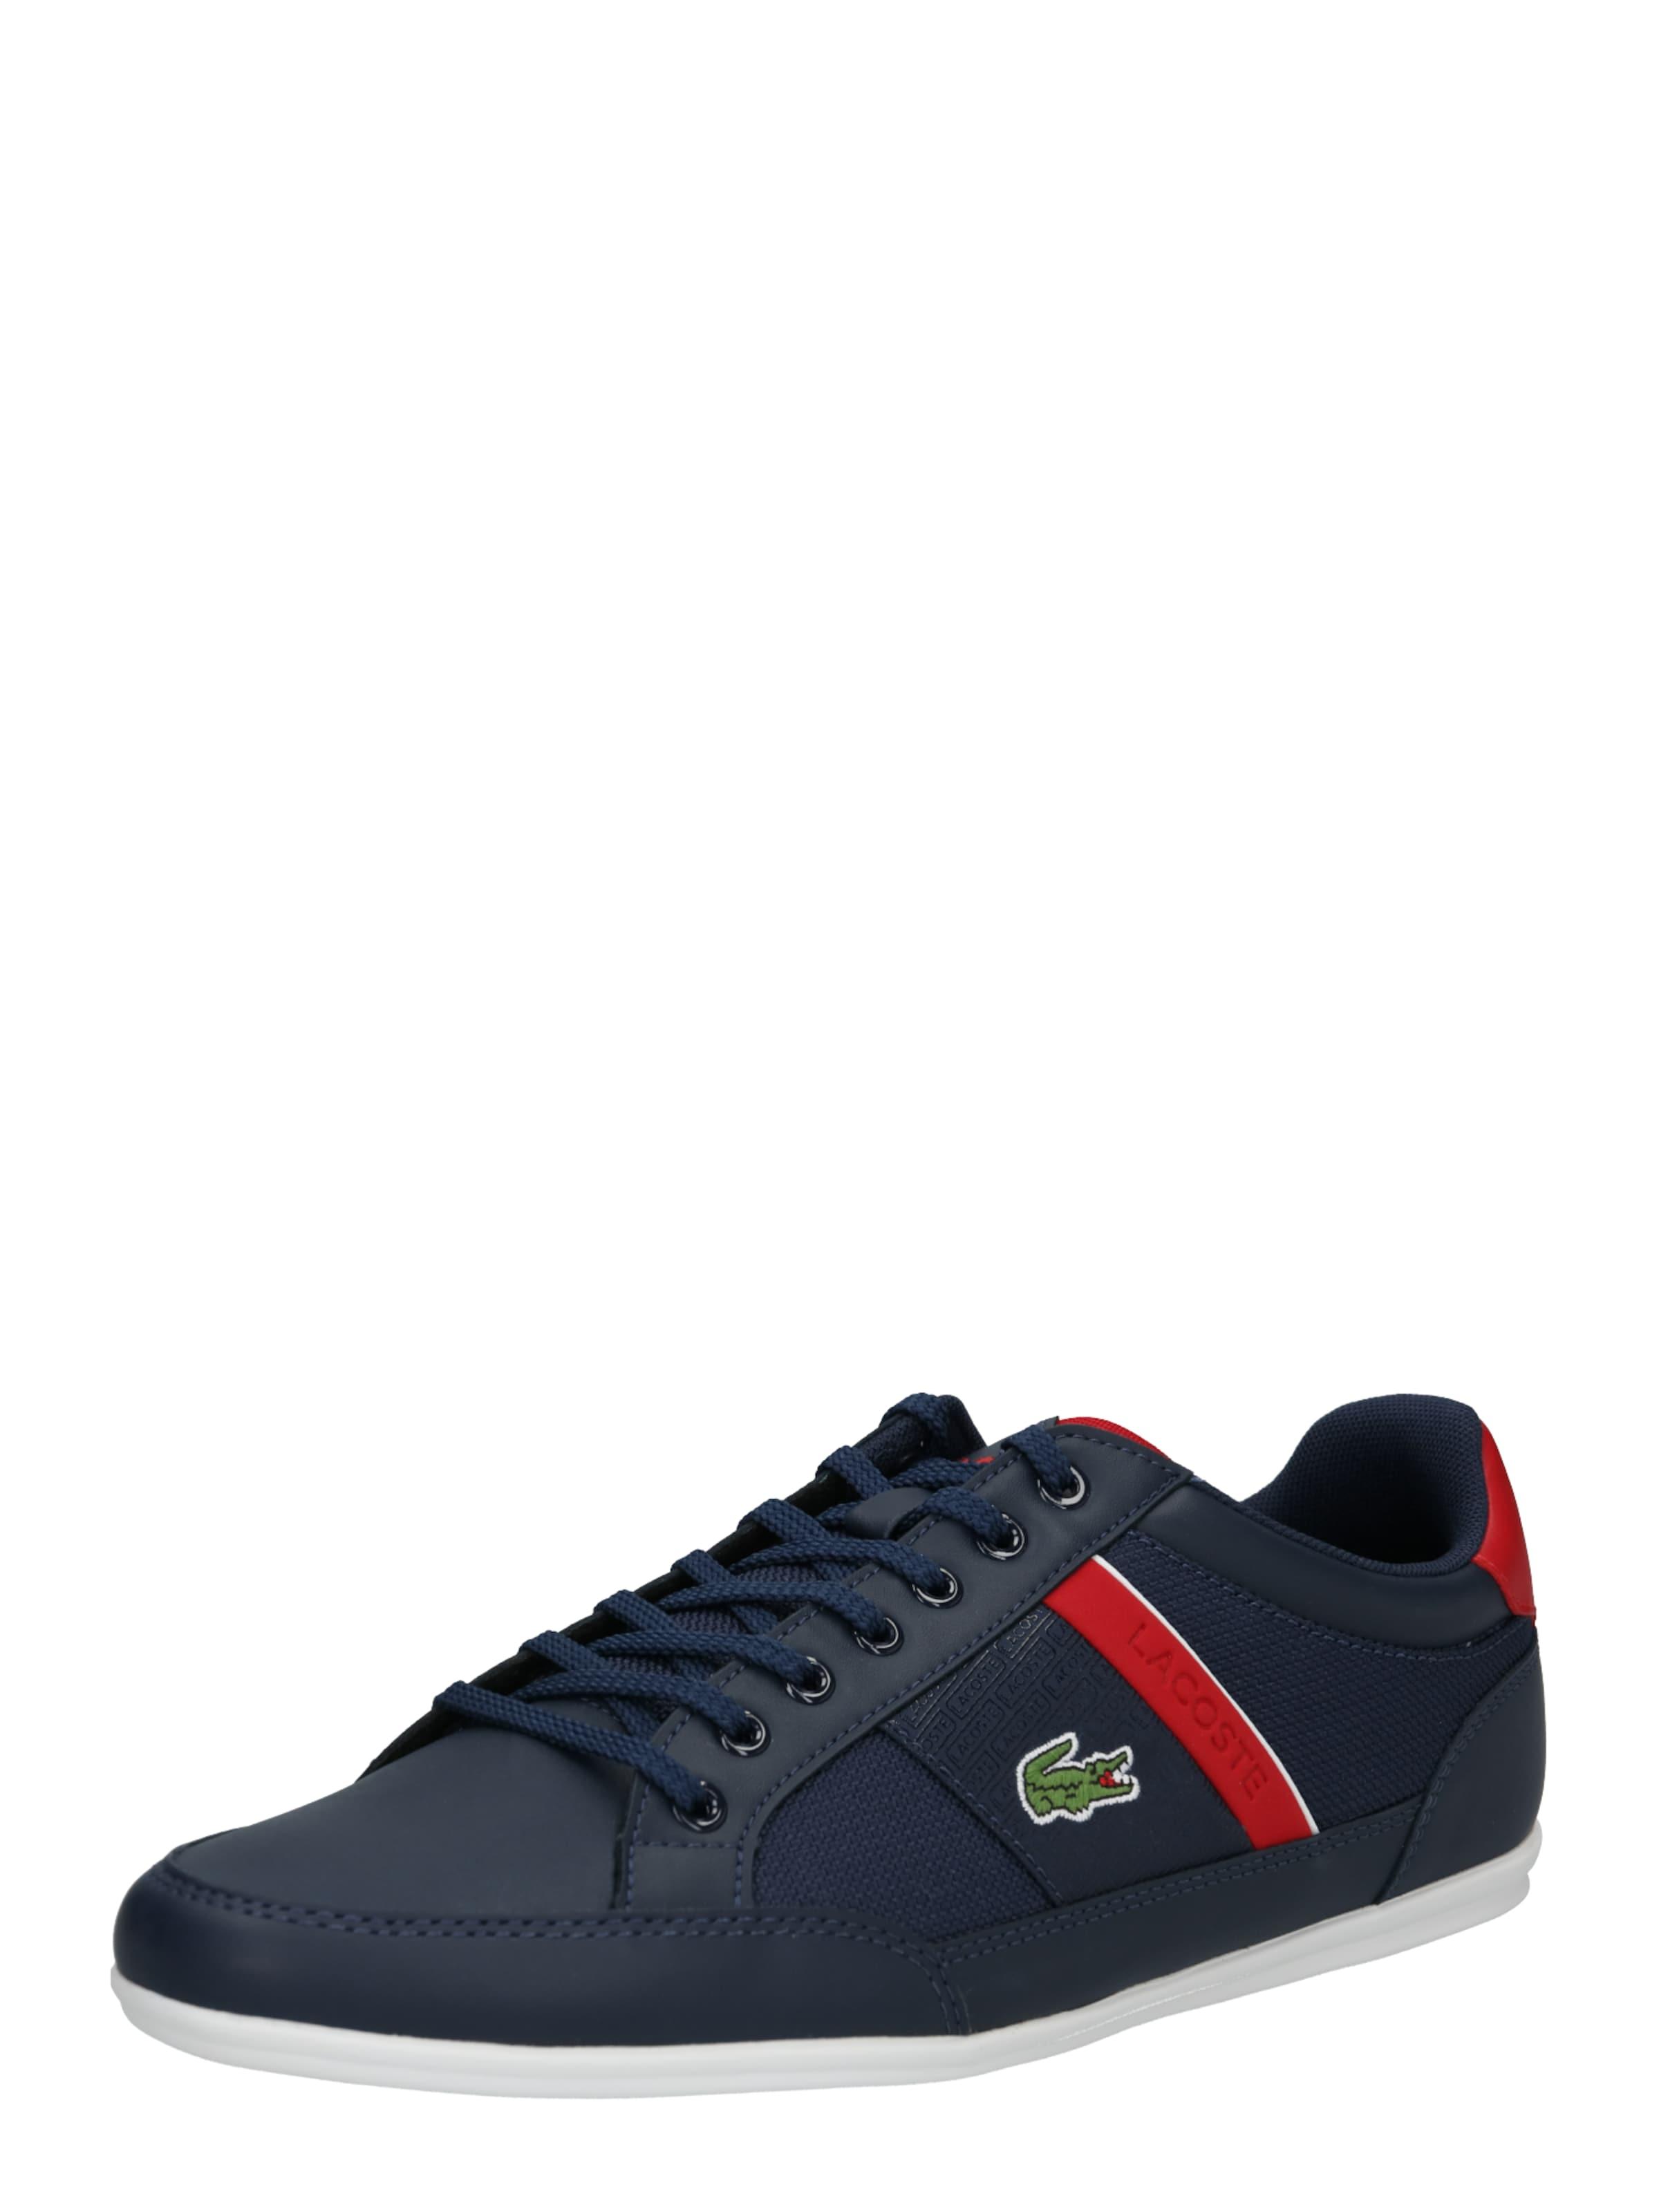 Cma' DunkelgrünSchwarz Sneaker 319 'chaymon 3 In Lacoste PXiOuTkZ